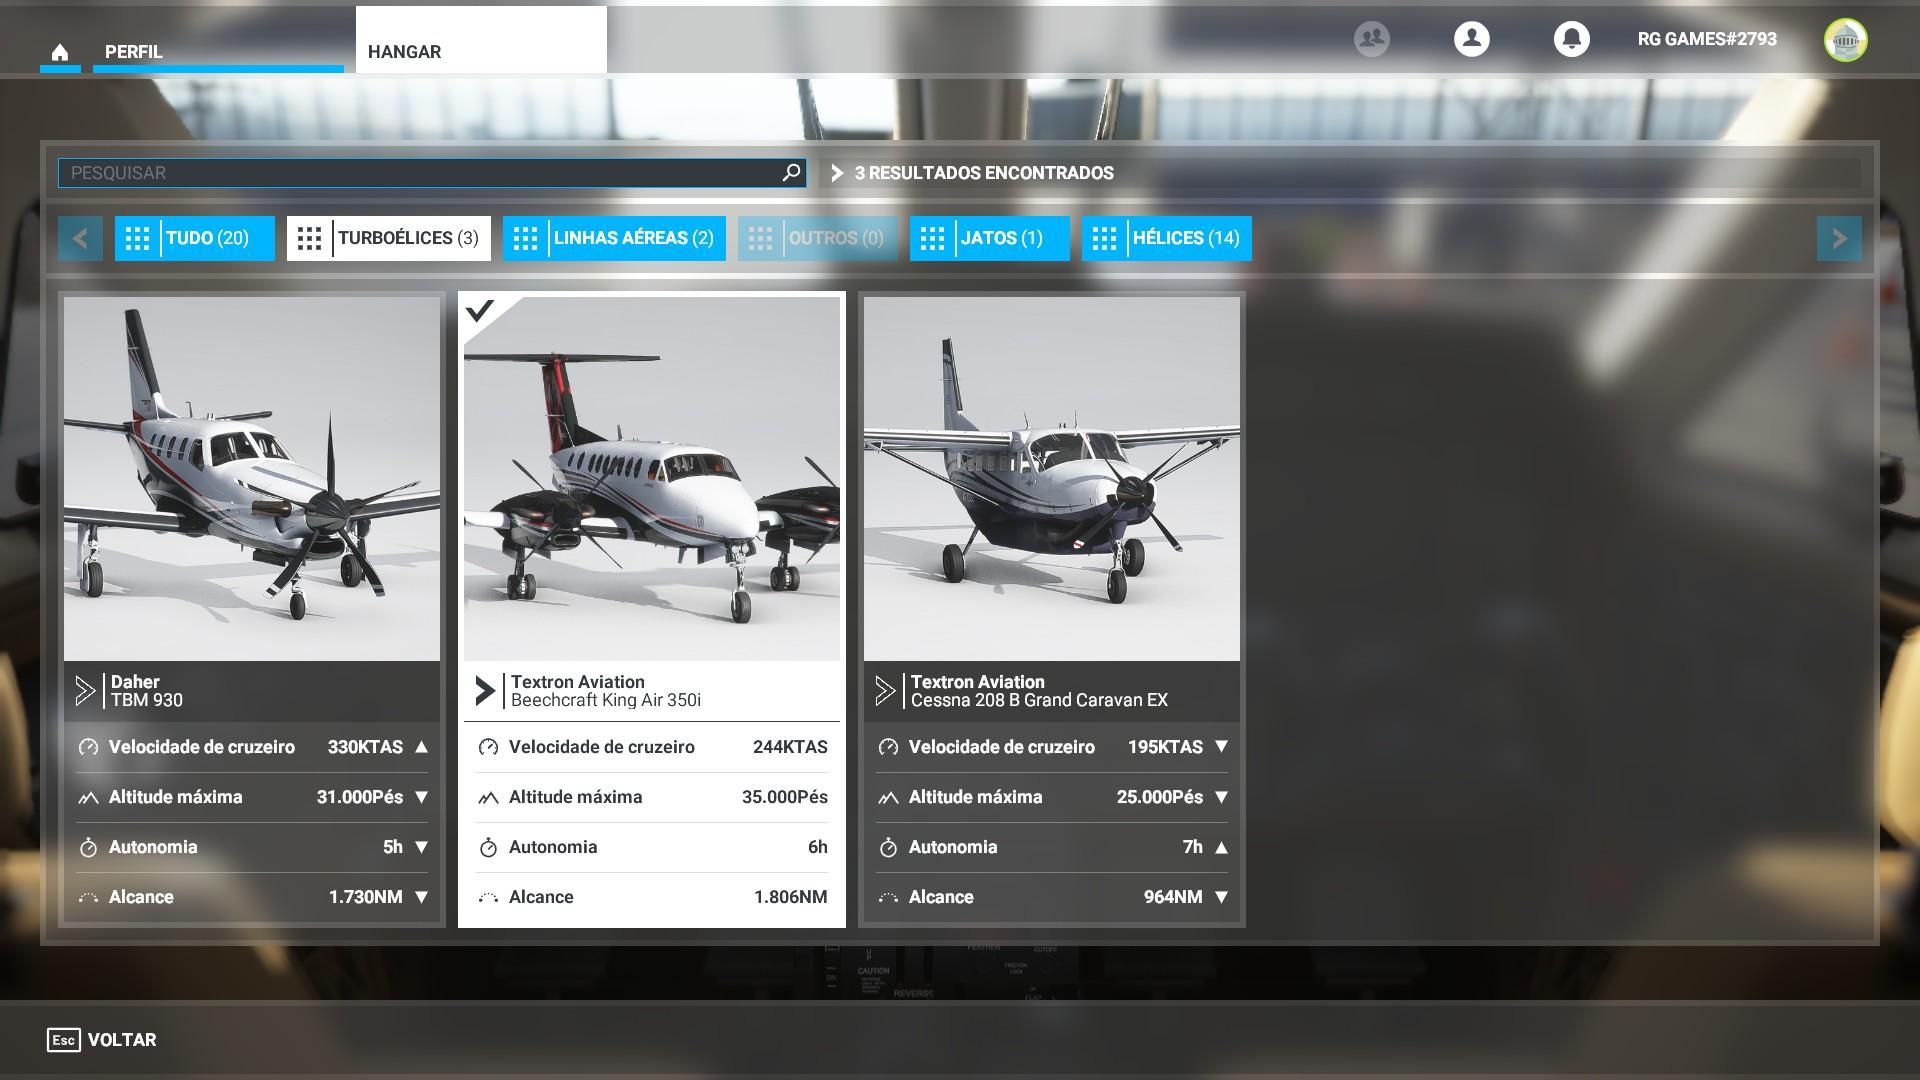 Aviões Turboélices - Flight Simulator